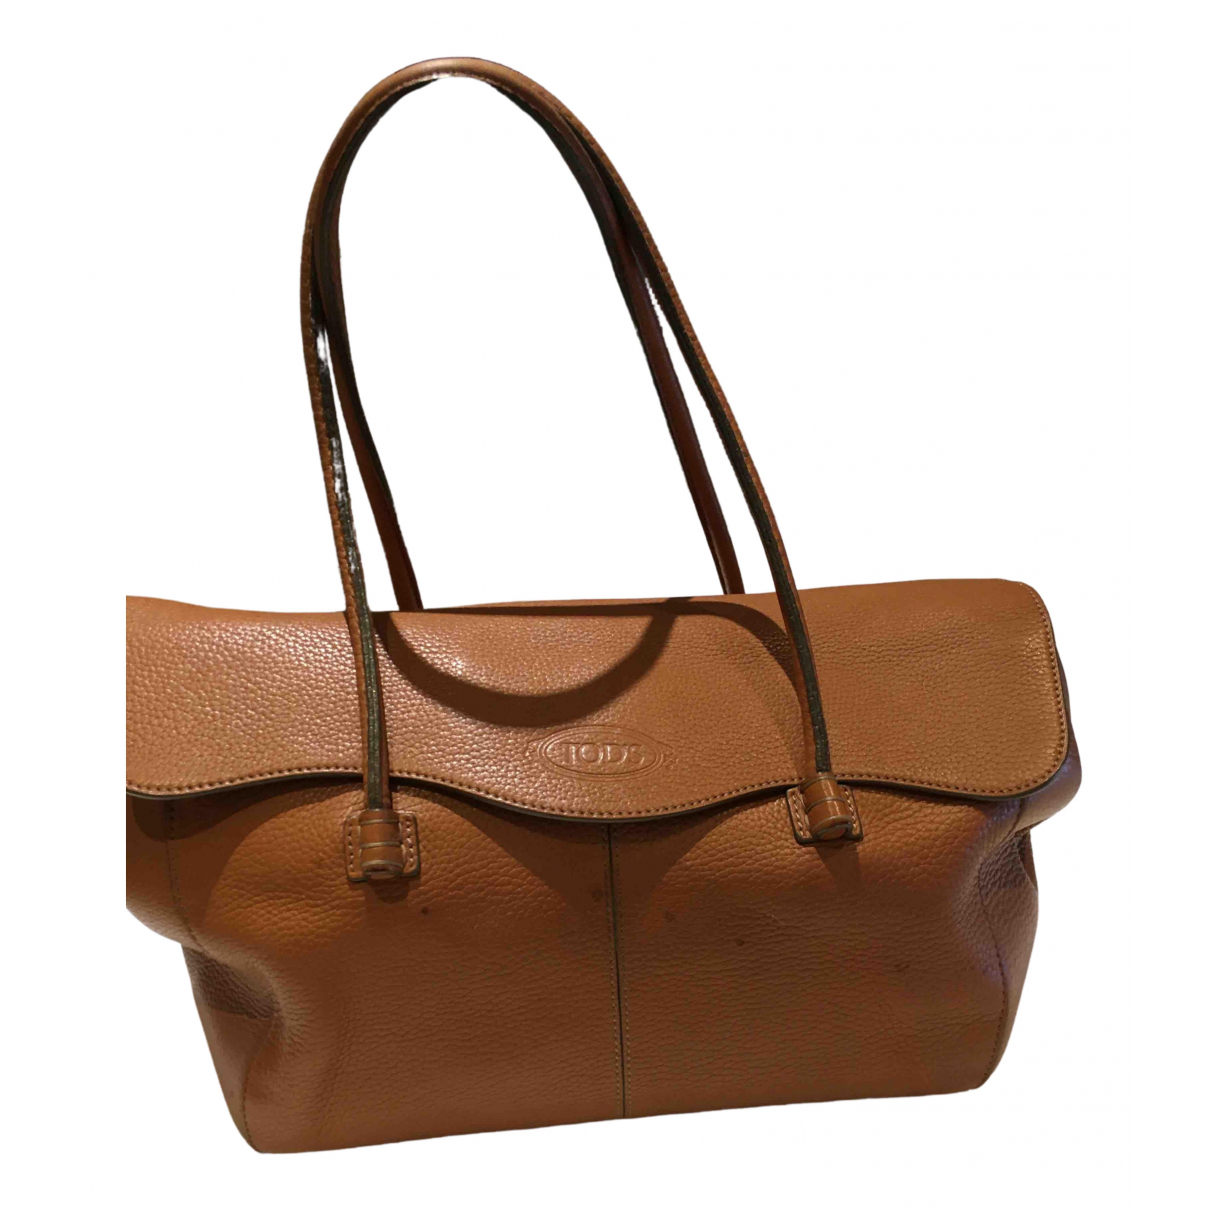 Tod's N Camel Leather handbag for Women N